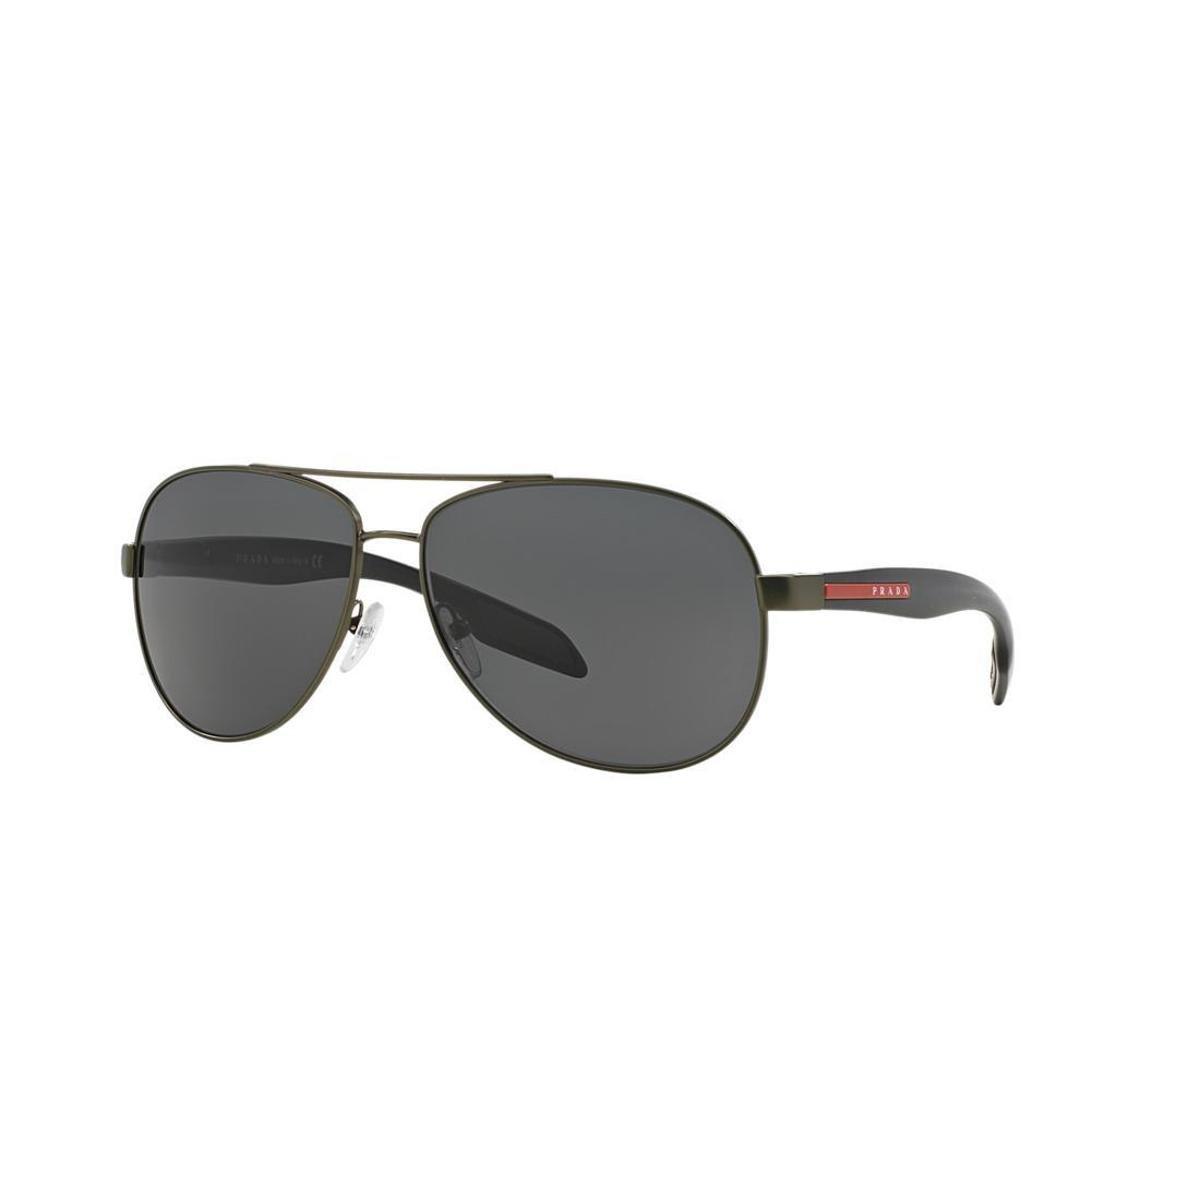 Óculos de Sol Prada Linea Rossa PS 53PS Benbow - Compre Agora   Zattini bba7552ee9